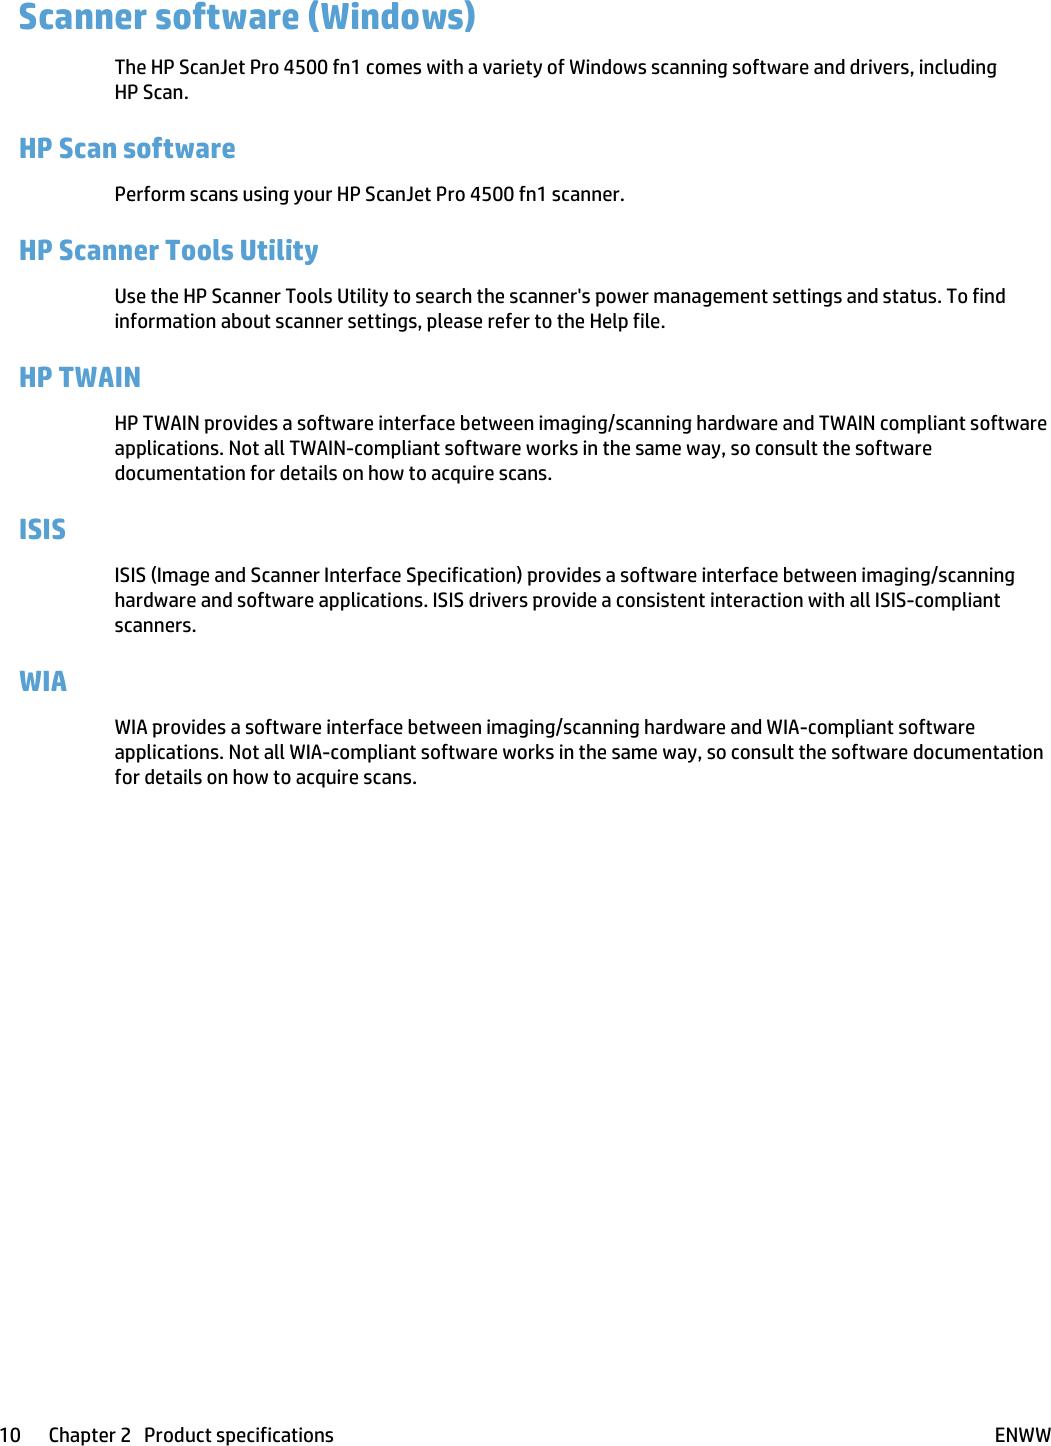 HP ScanJet Pro 4500 Fn1 Network Scanner User Guide ENWW